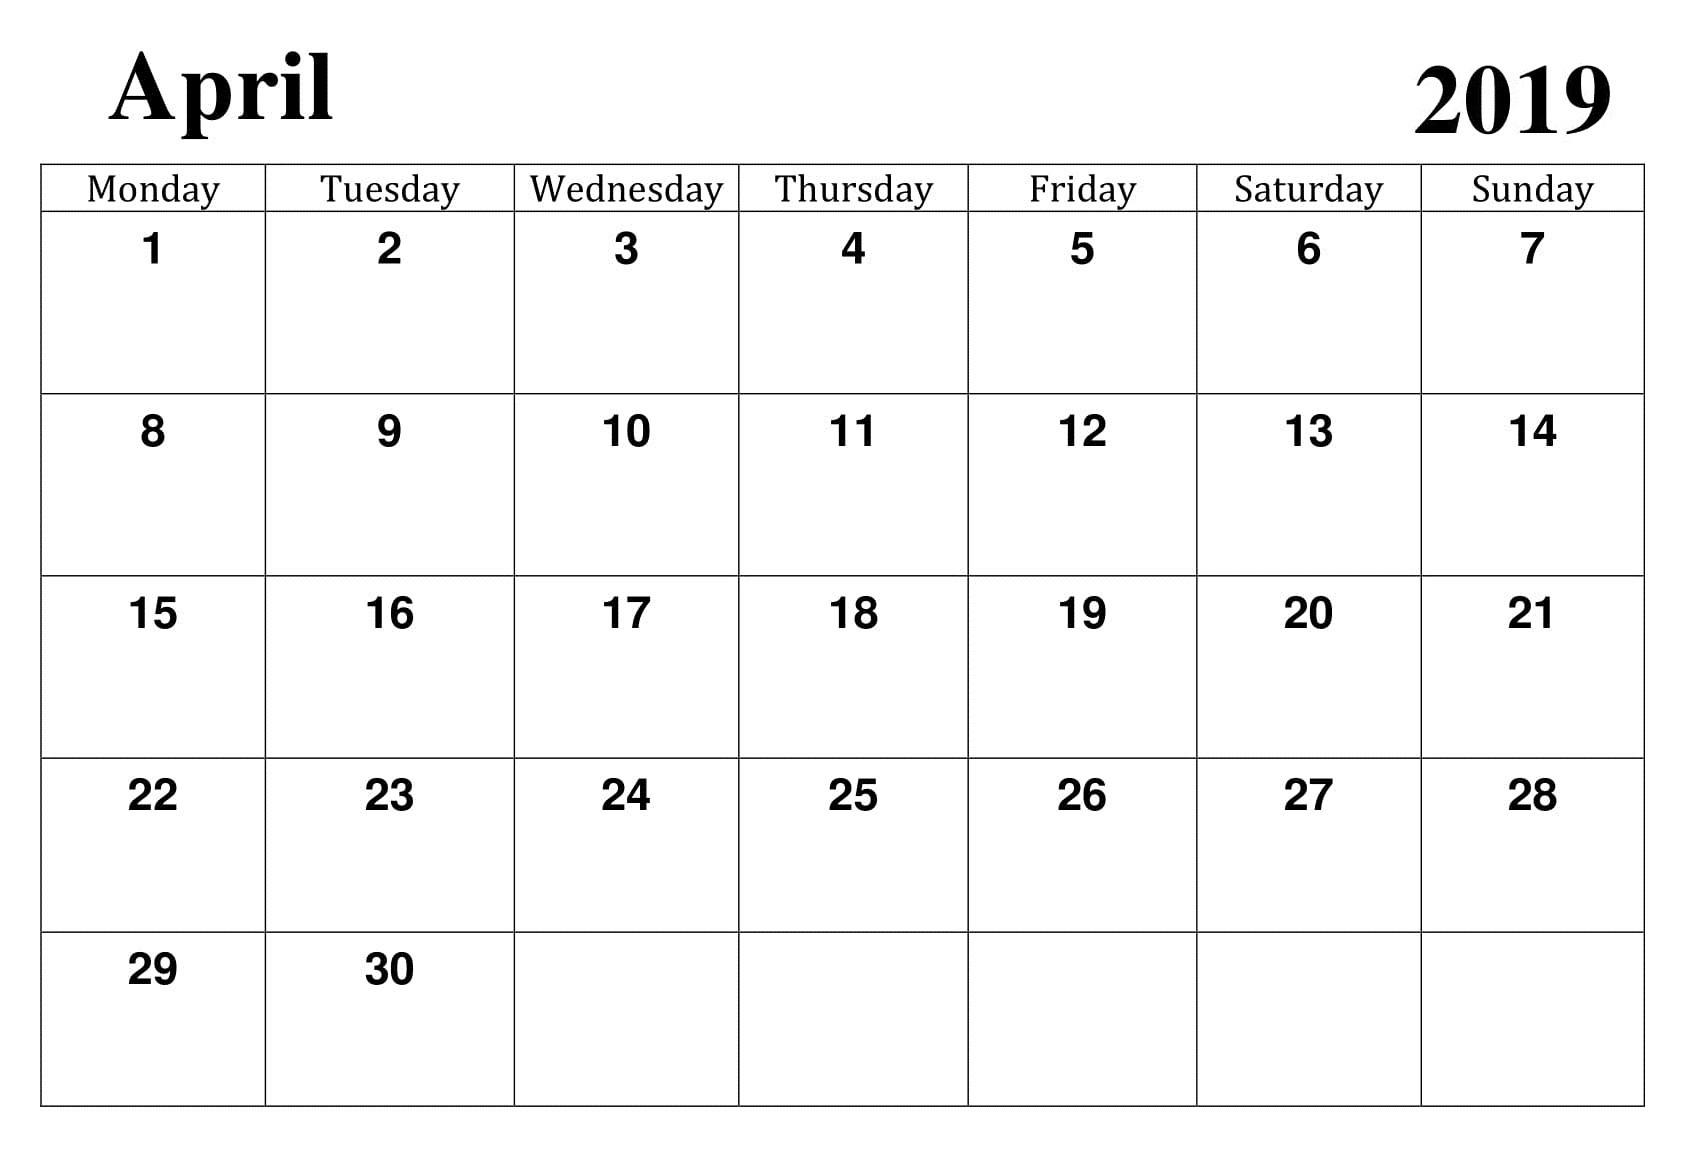 Printable Google Calendar Printable April 2019 Google Calendar Template